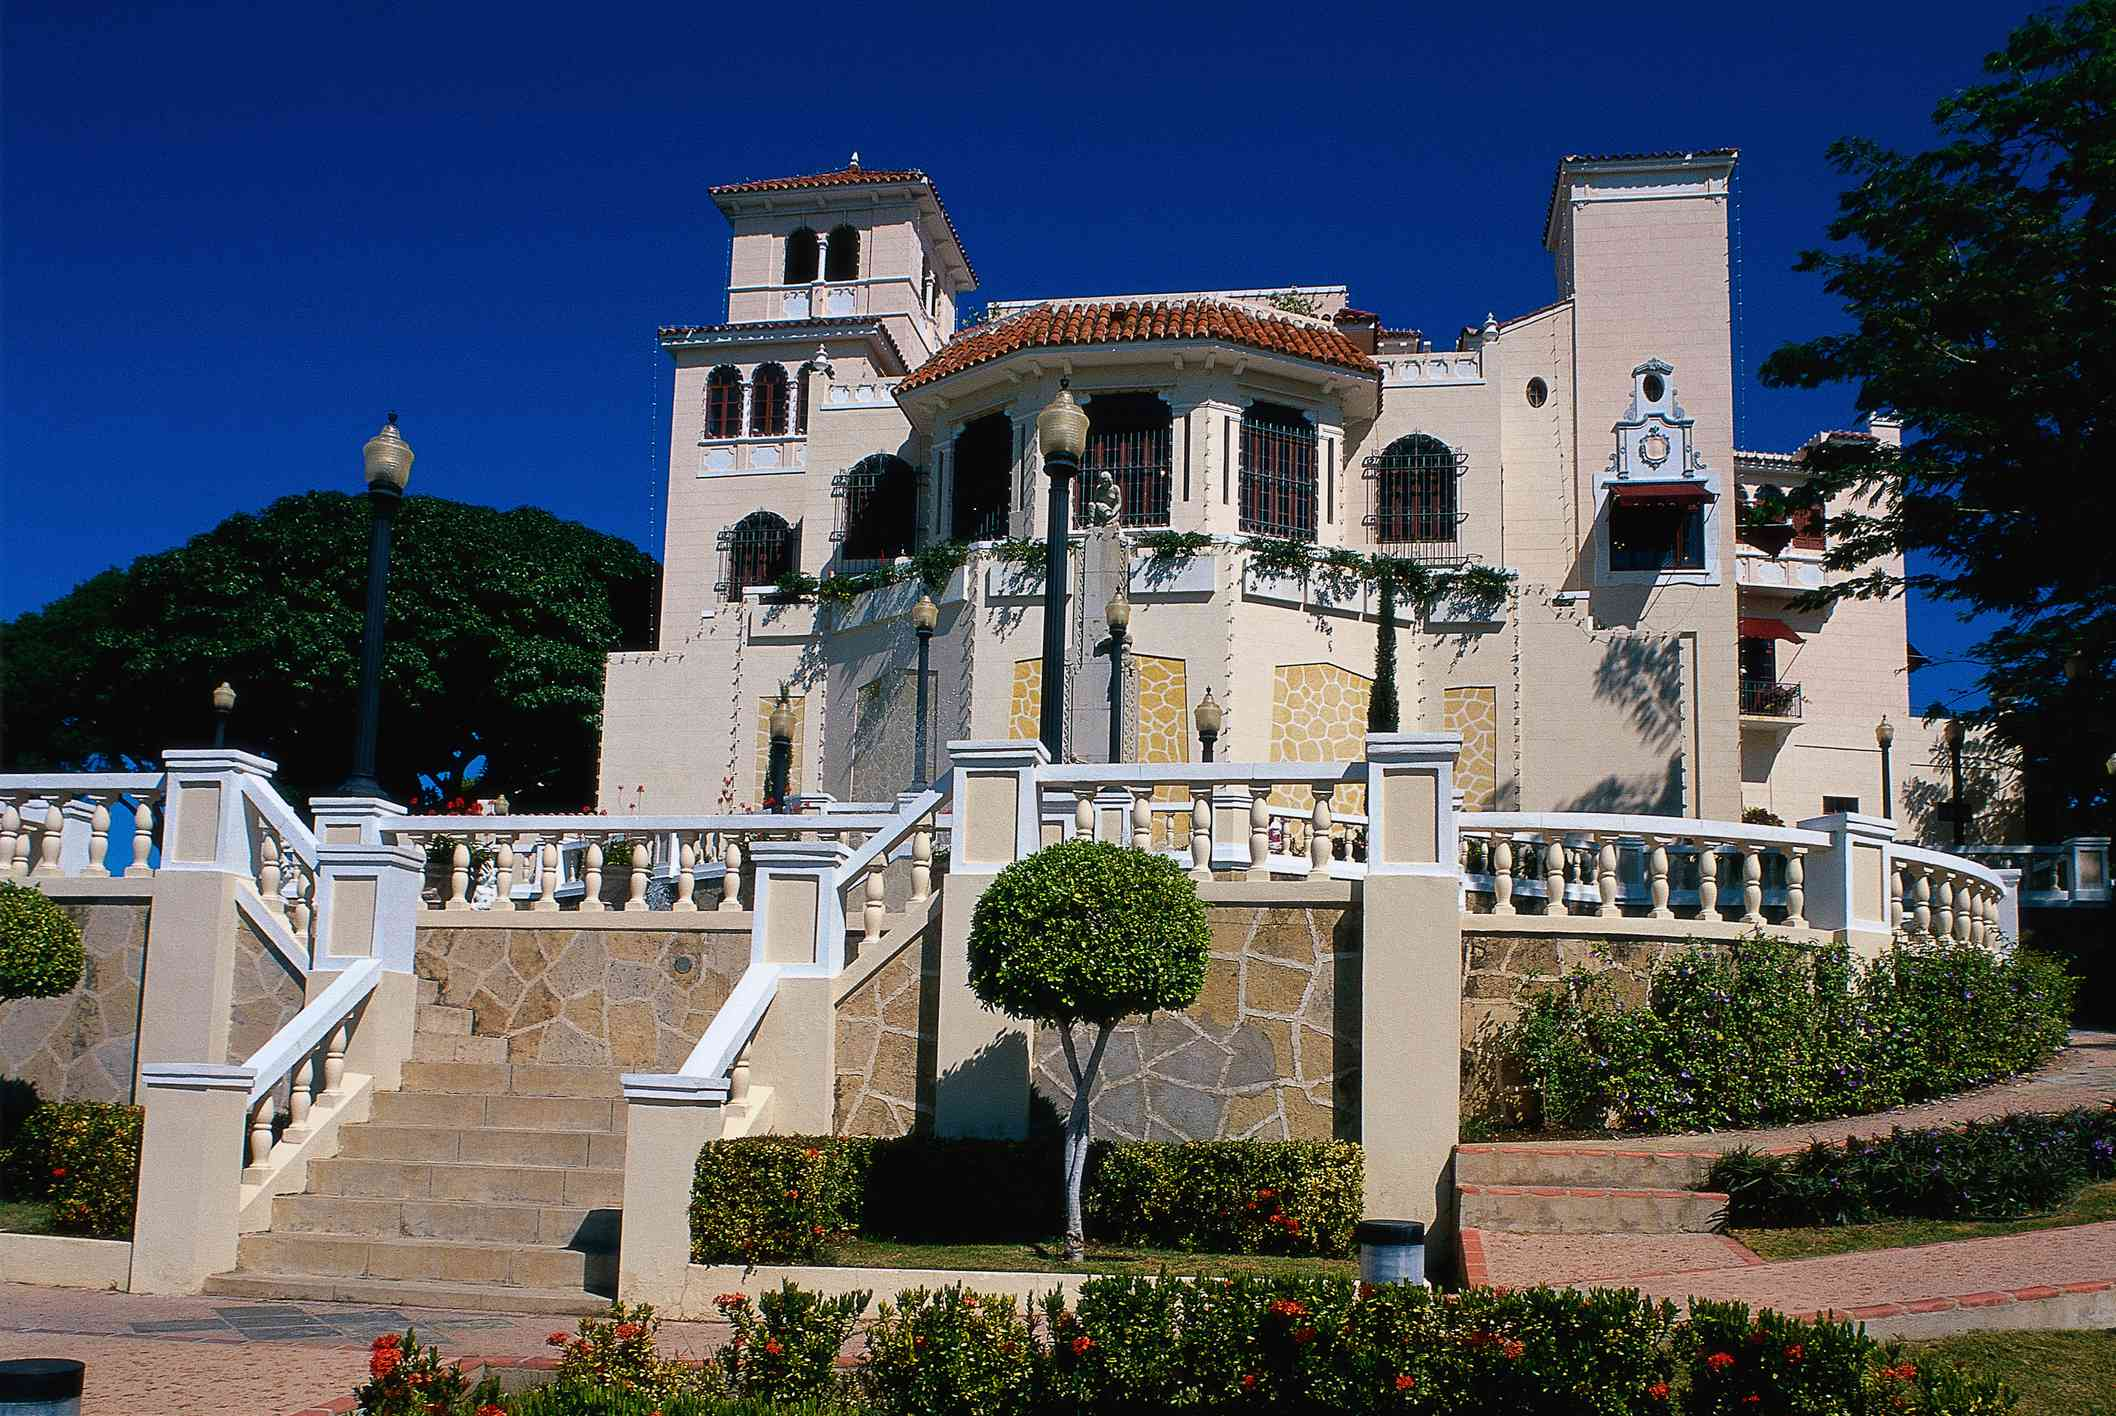 Edificio principal del Castillo Serralles